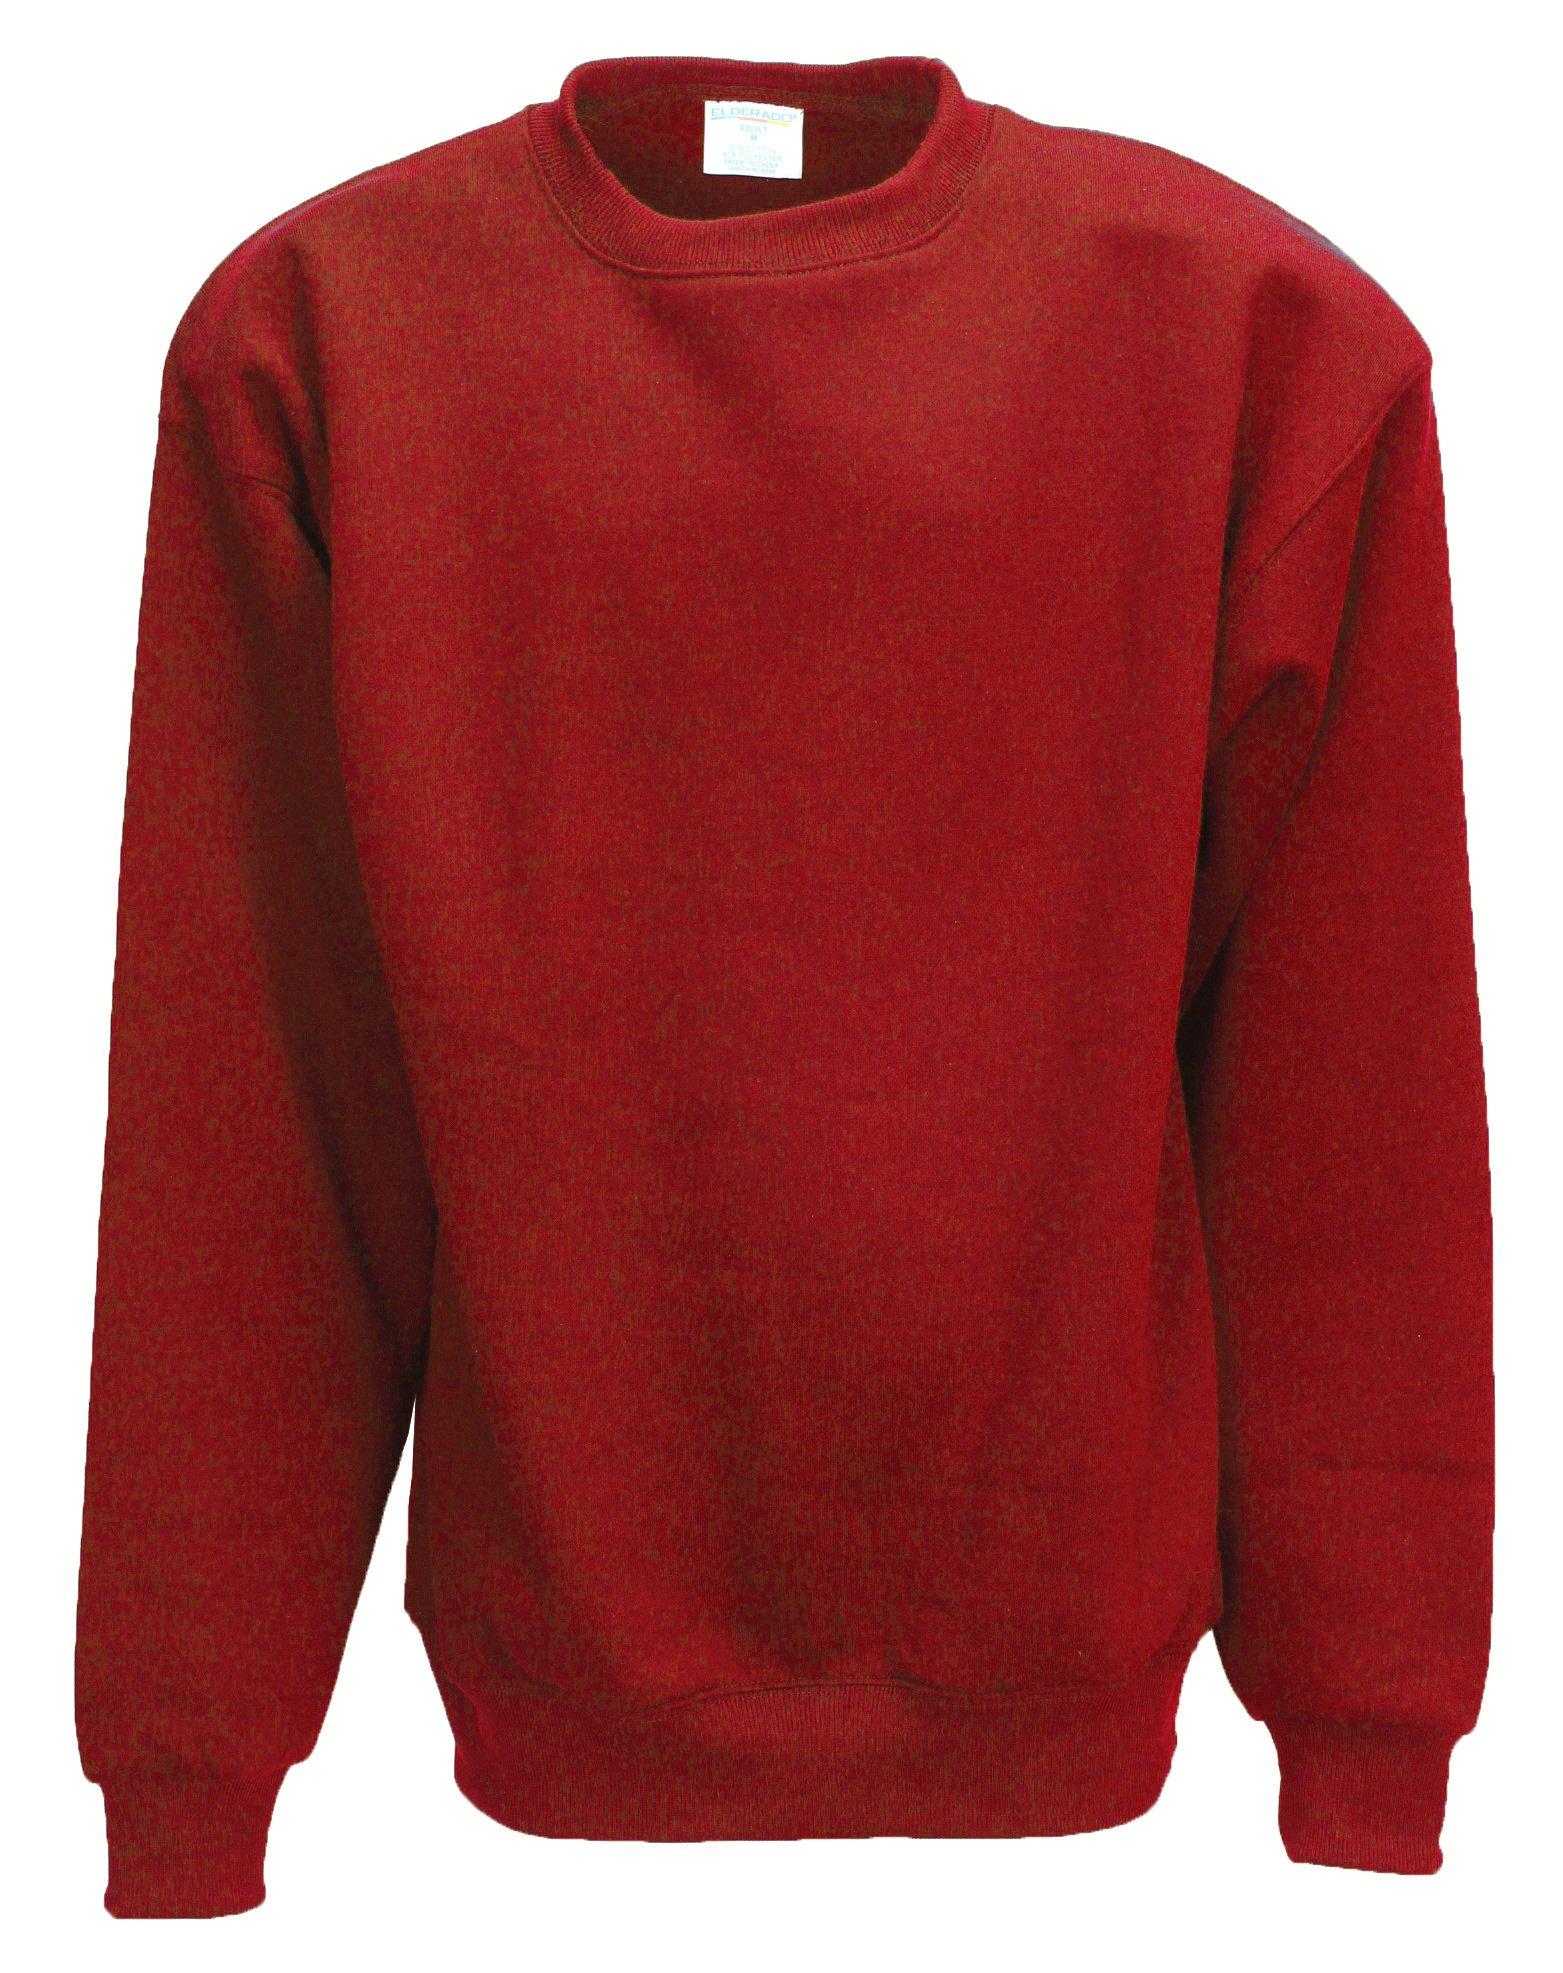 St. Philip Crew Sweatshirt with Embroidered Logo